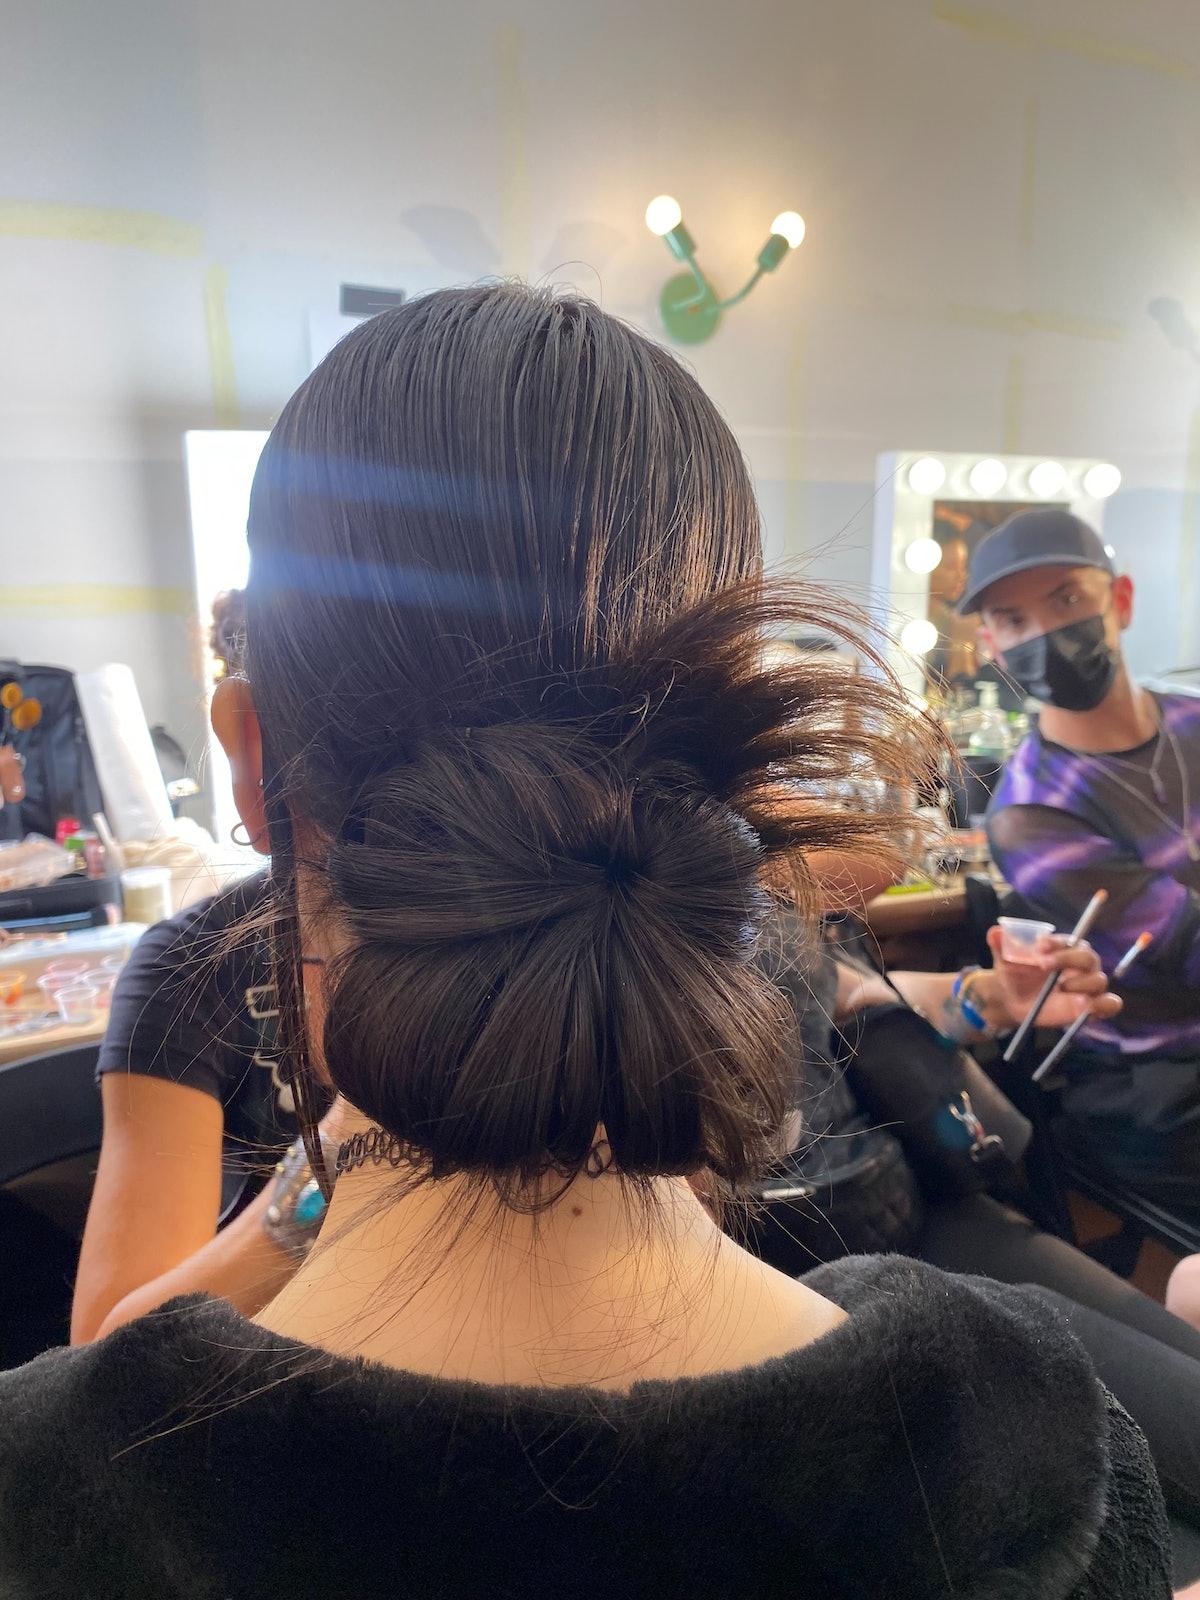 Anna Sui S/S '22 model hair